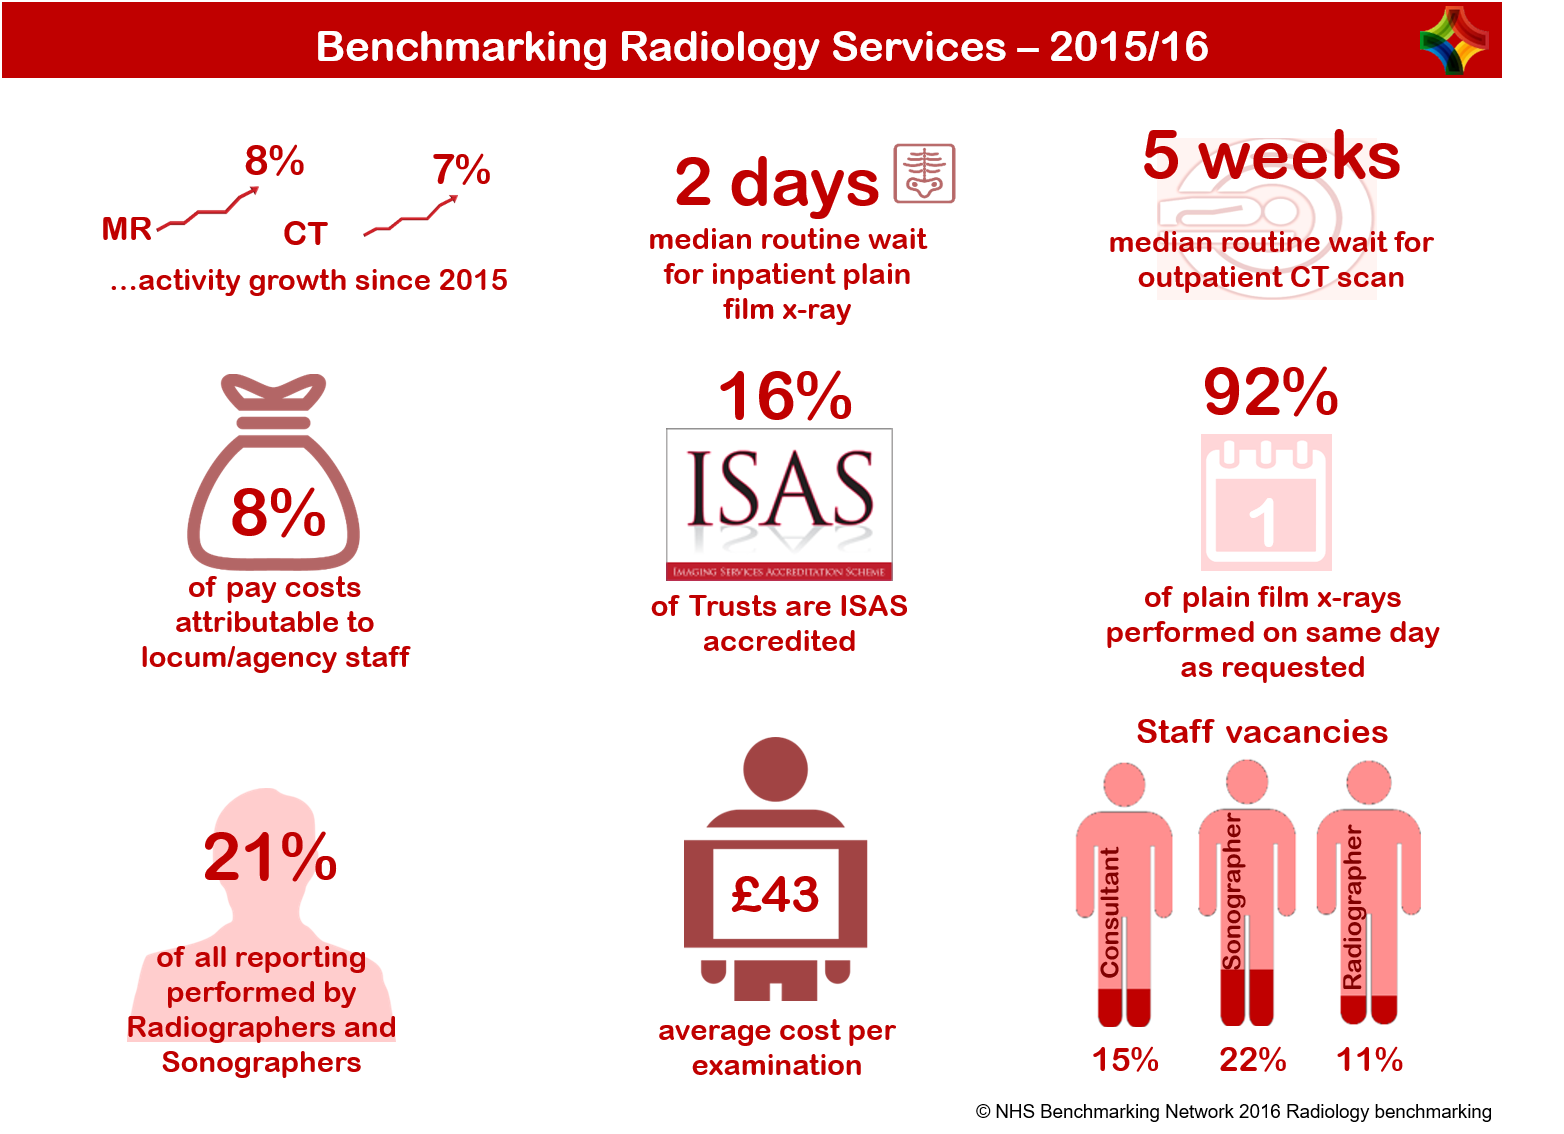 Benchmarking Radiology Service - 2015/16